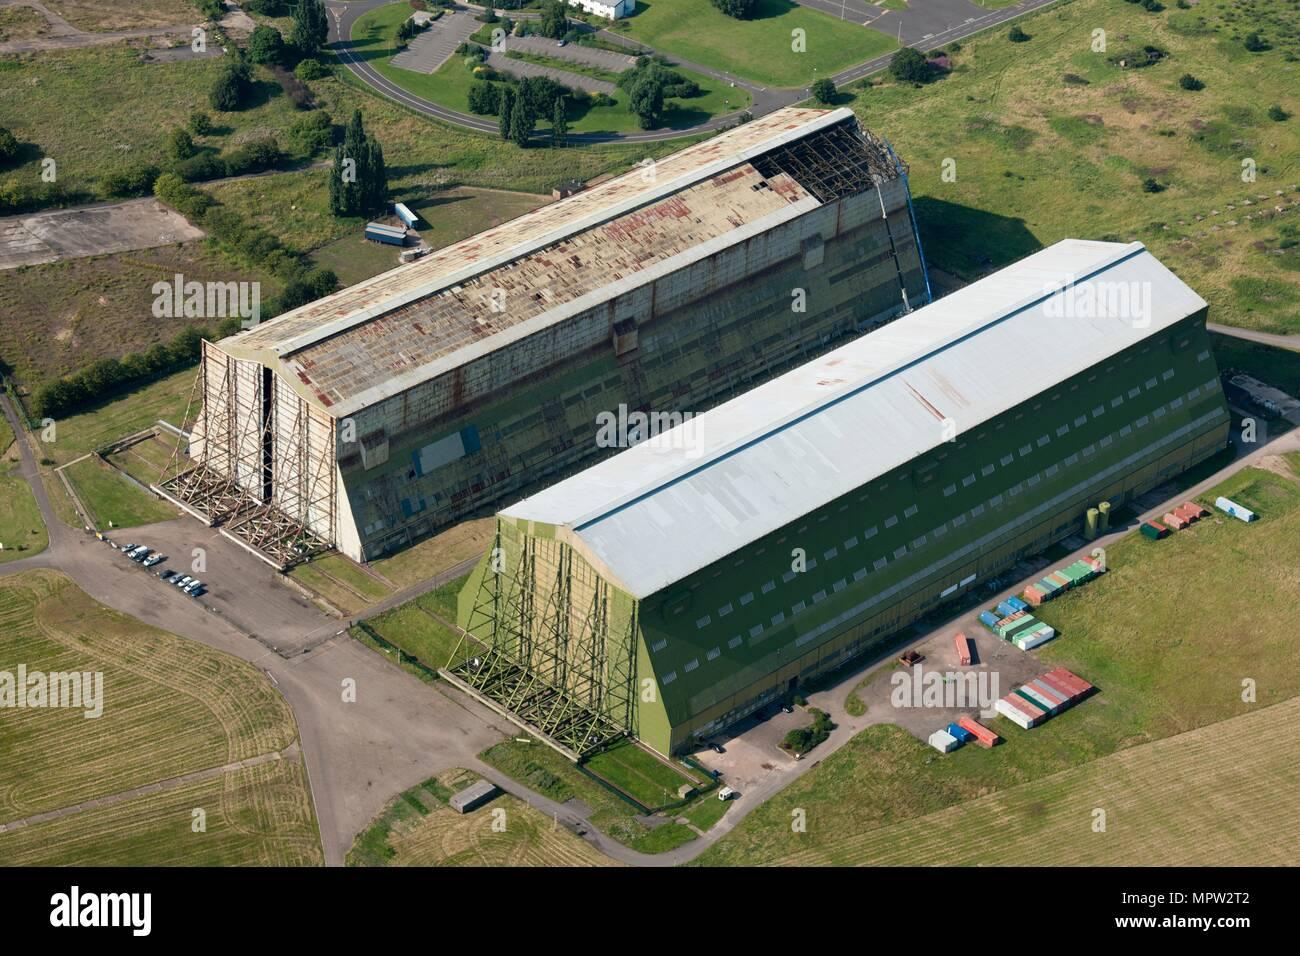 Airship hangars, RAF Cardington, Bedfordshire, c2010s(?). Artist: Damian Grady. - Stock Image